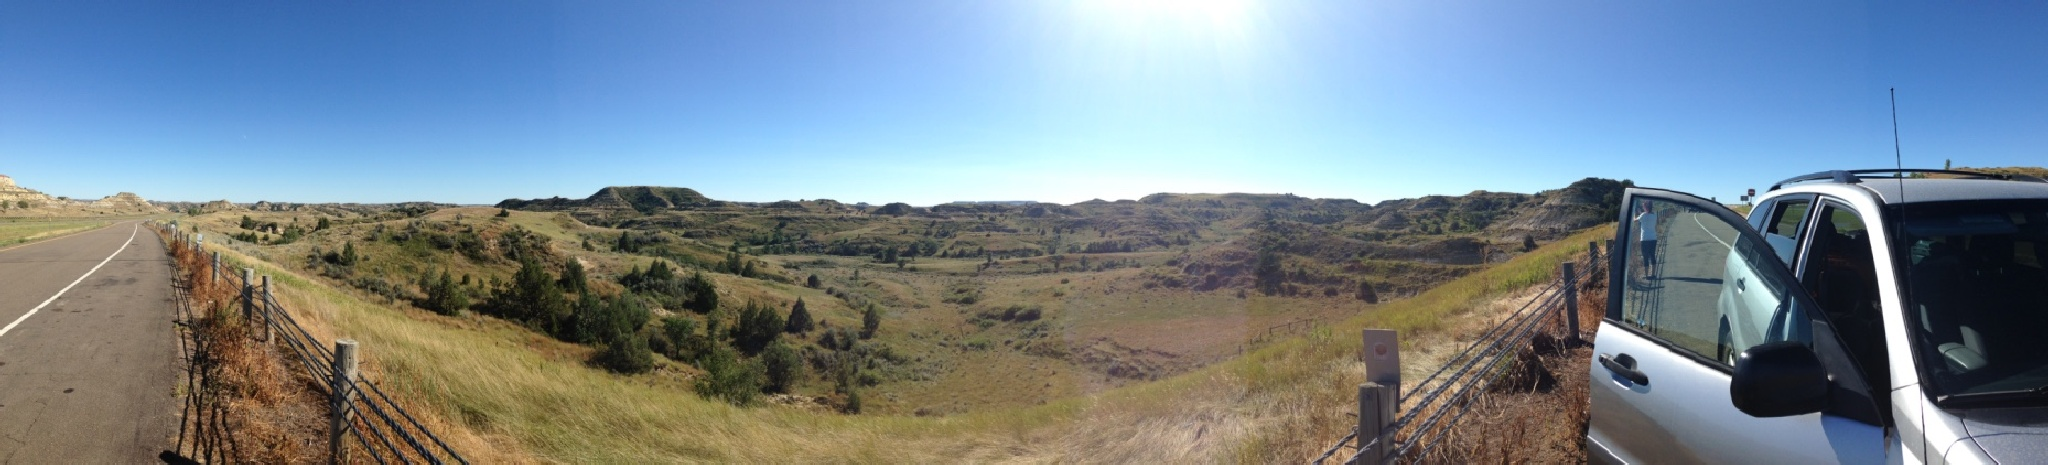 Road side panorama by samantha.jenkins.5030